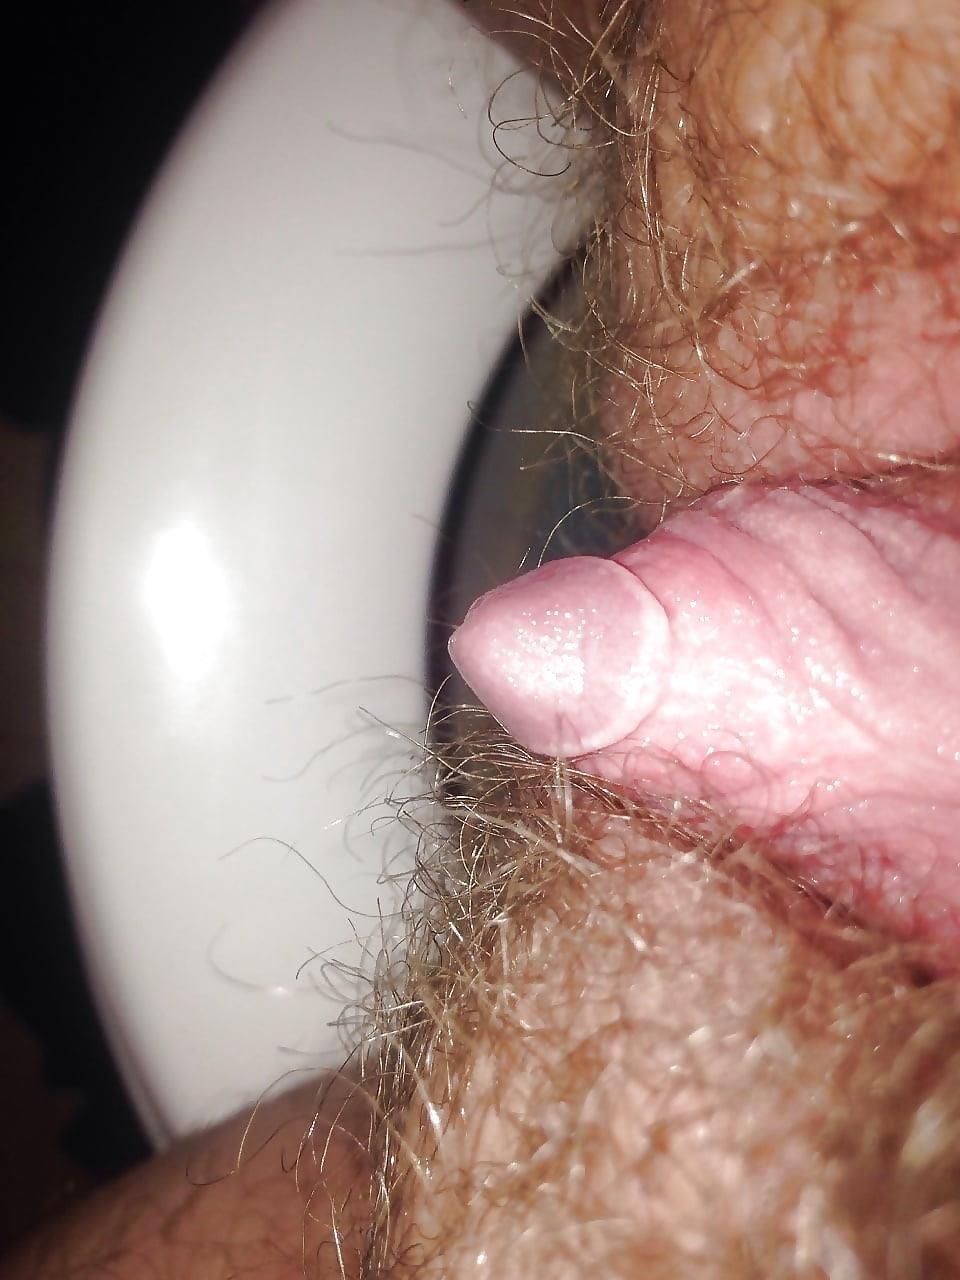 Porn large clitoris-6306